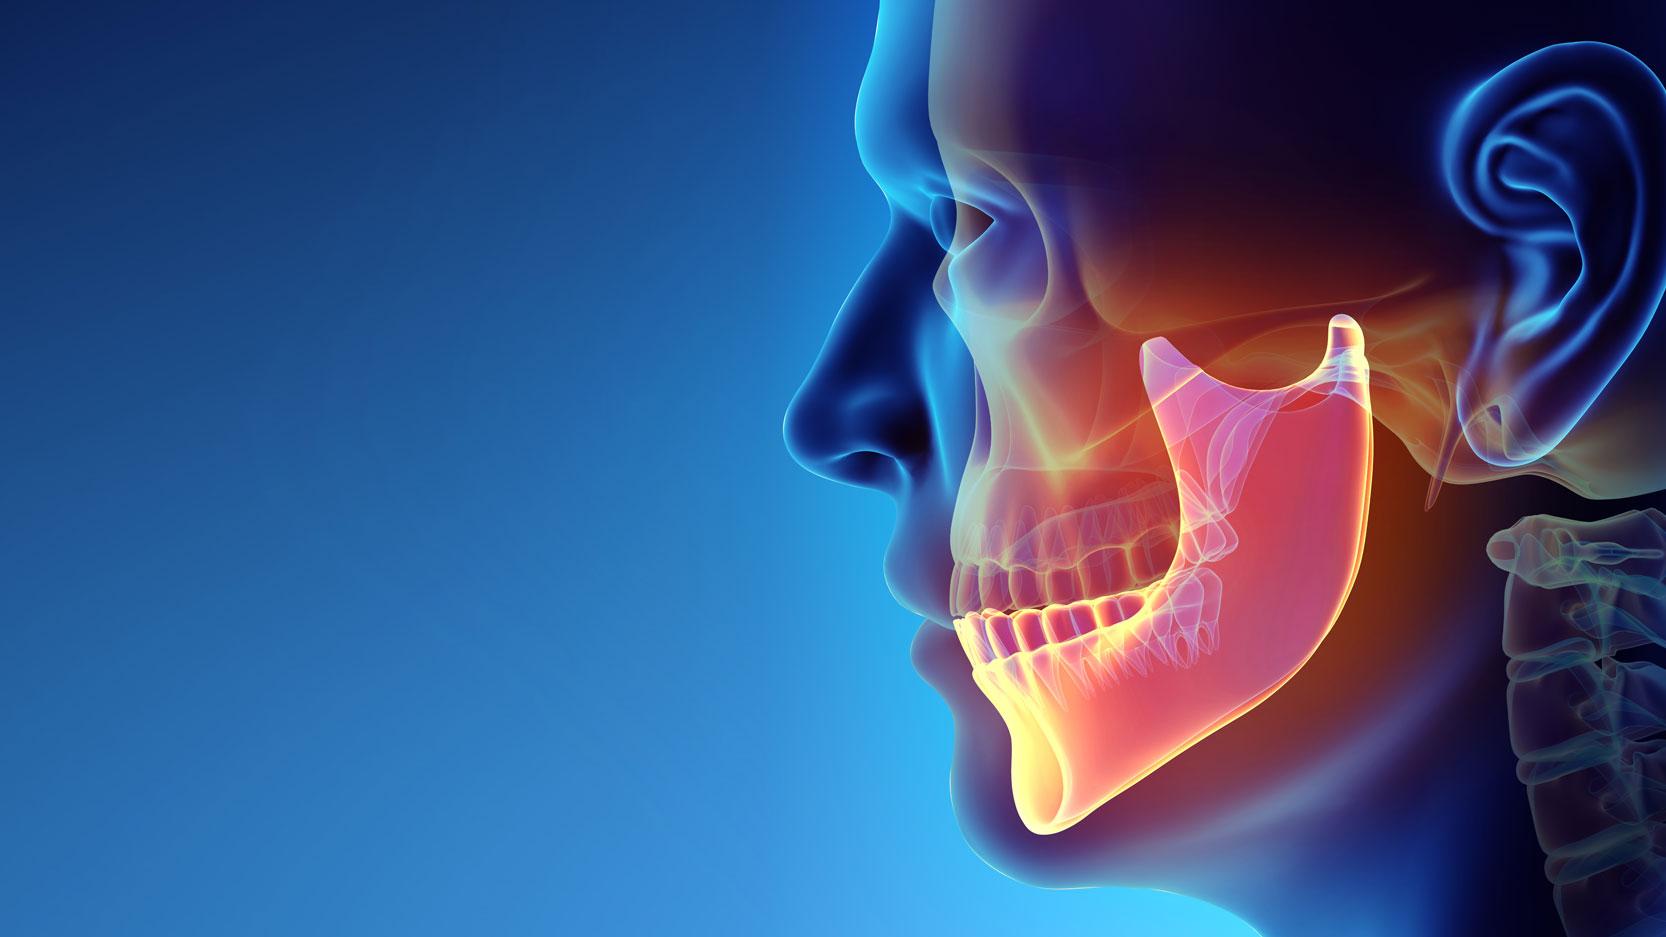 Facial Trauma Treatment Fort Wayne In Dr Lugakingira Jaw Wiring Surgery